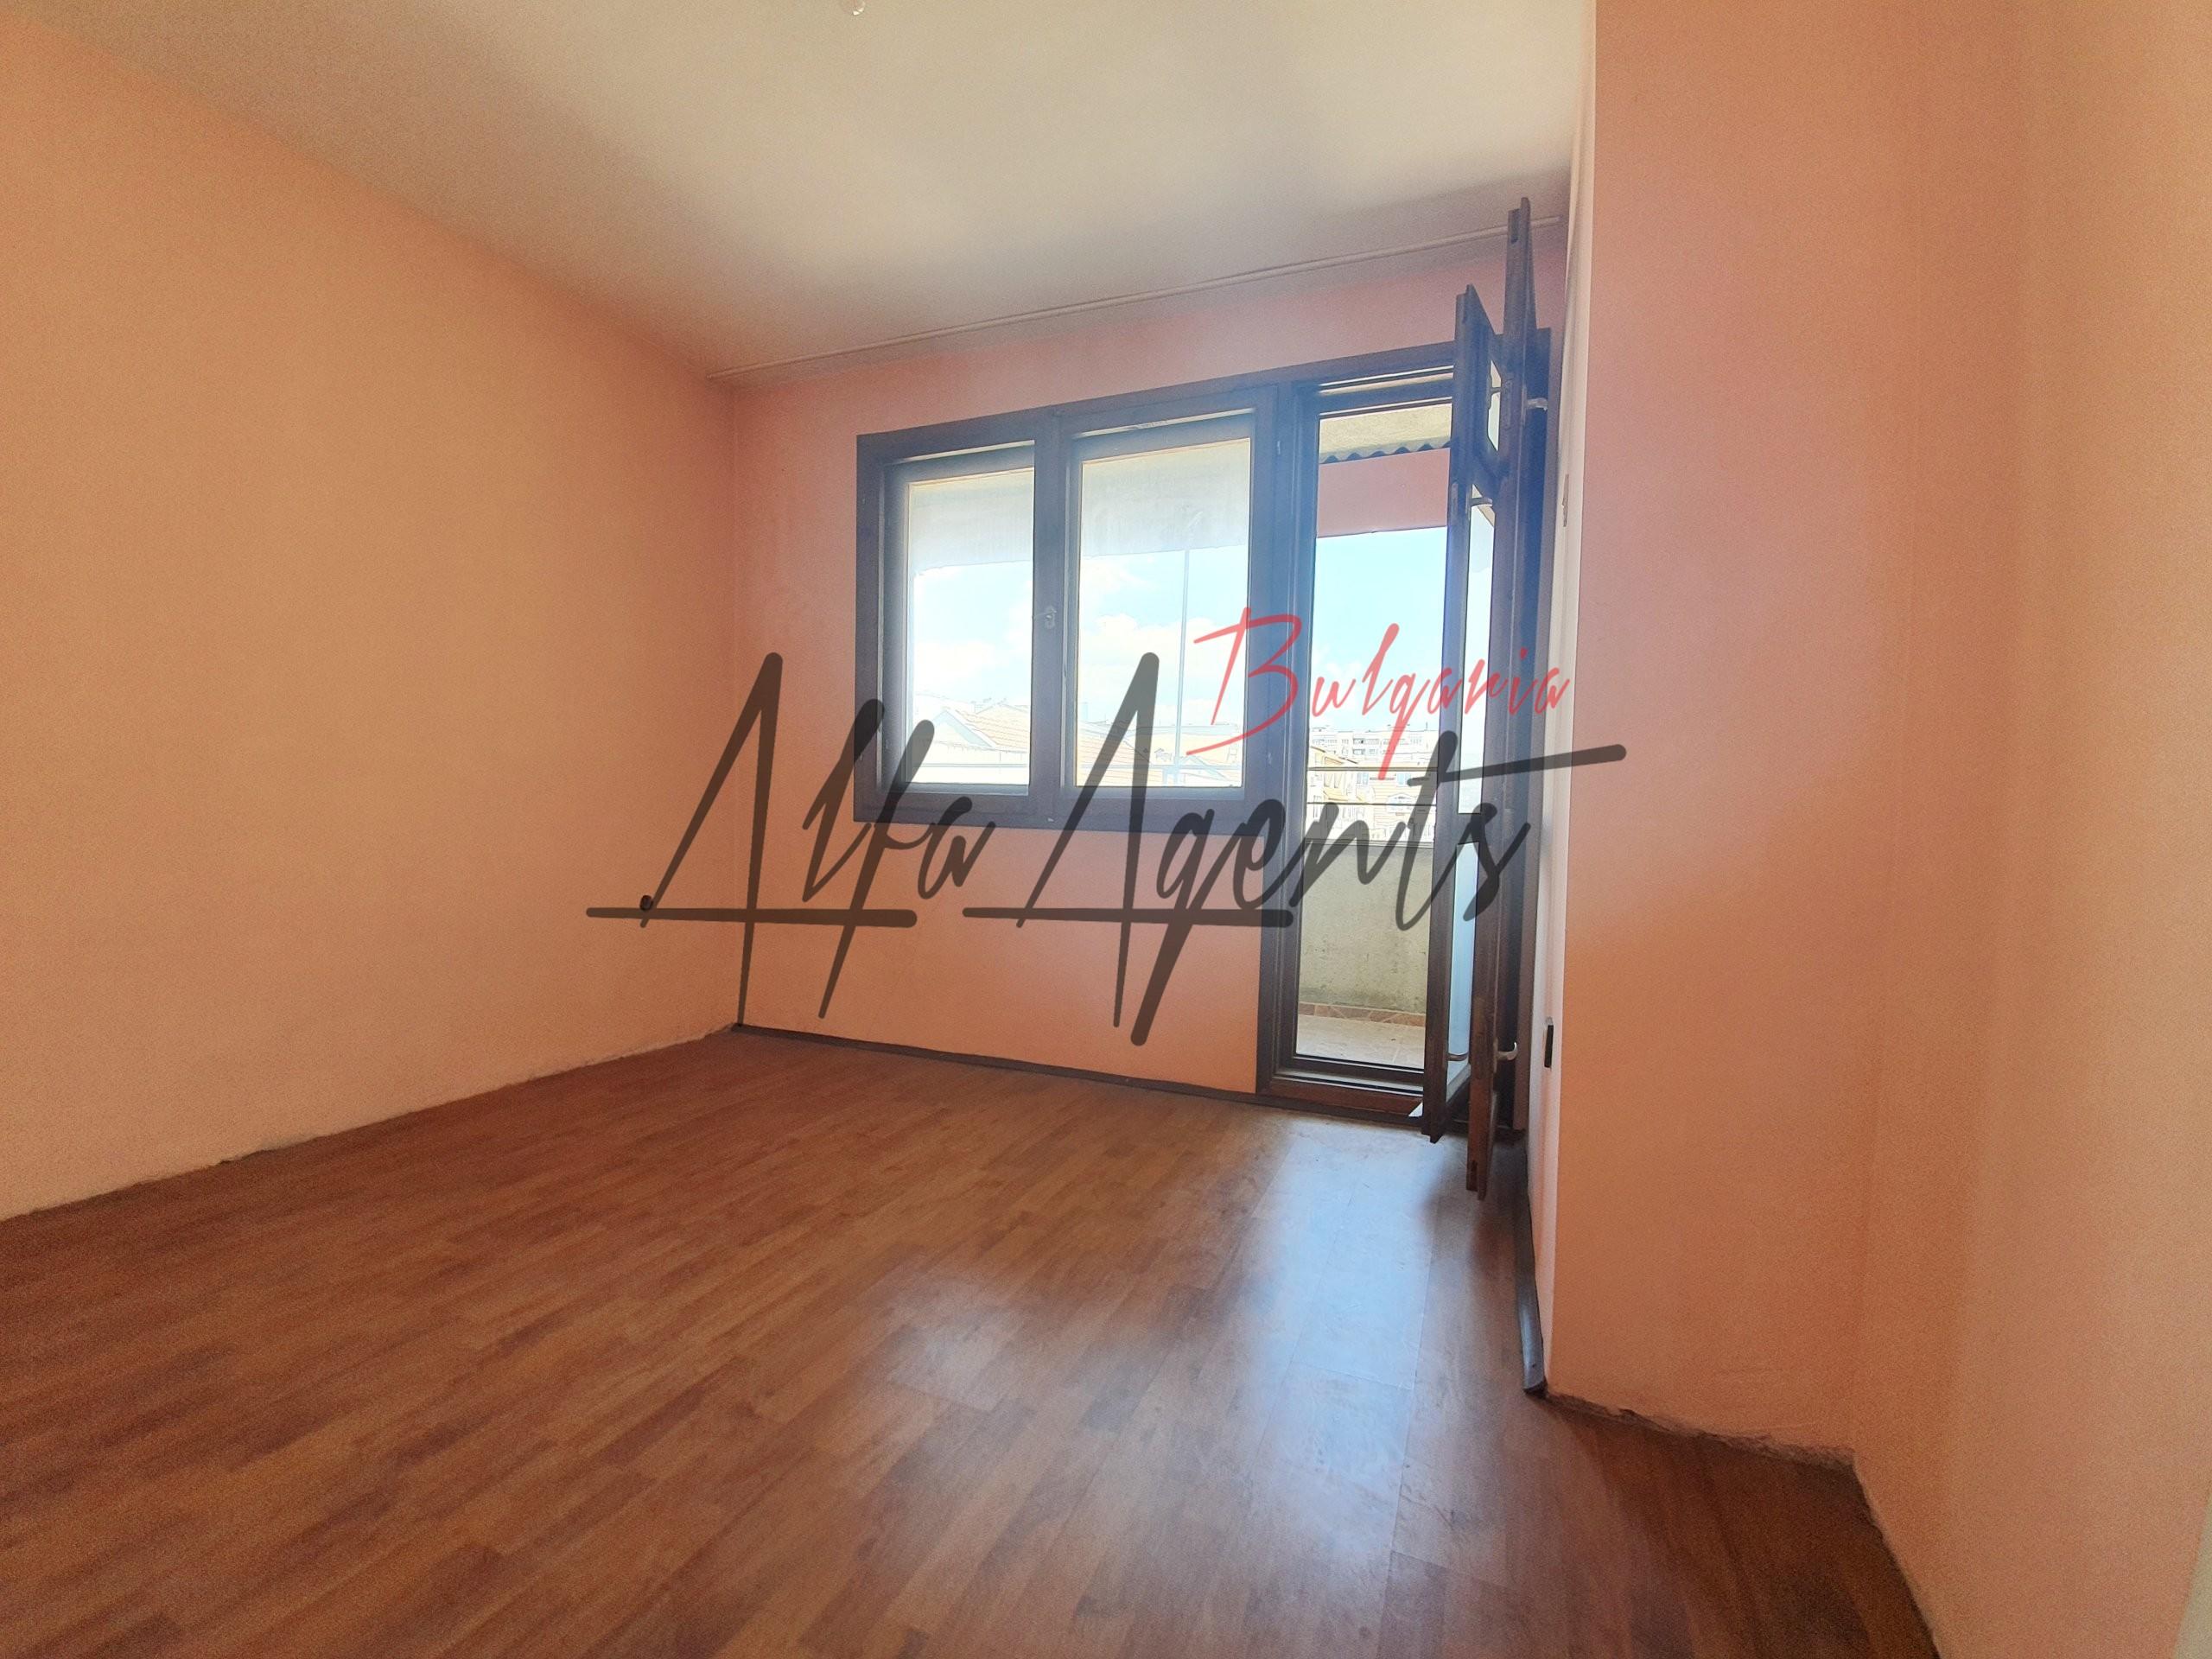 Алфа Агенти недвижими имоти Варна | Тристаен Апартамент, Нептун